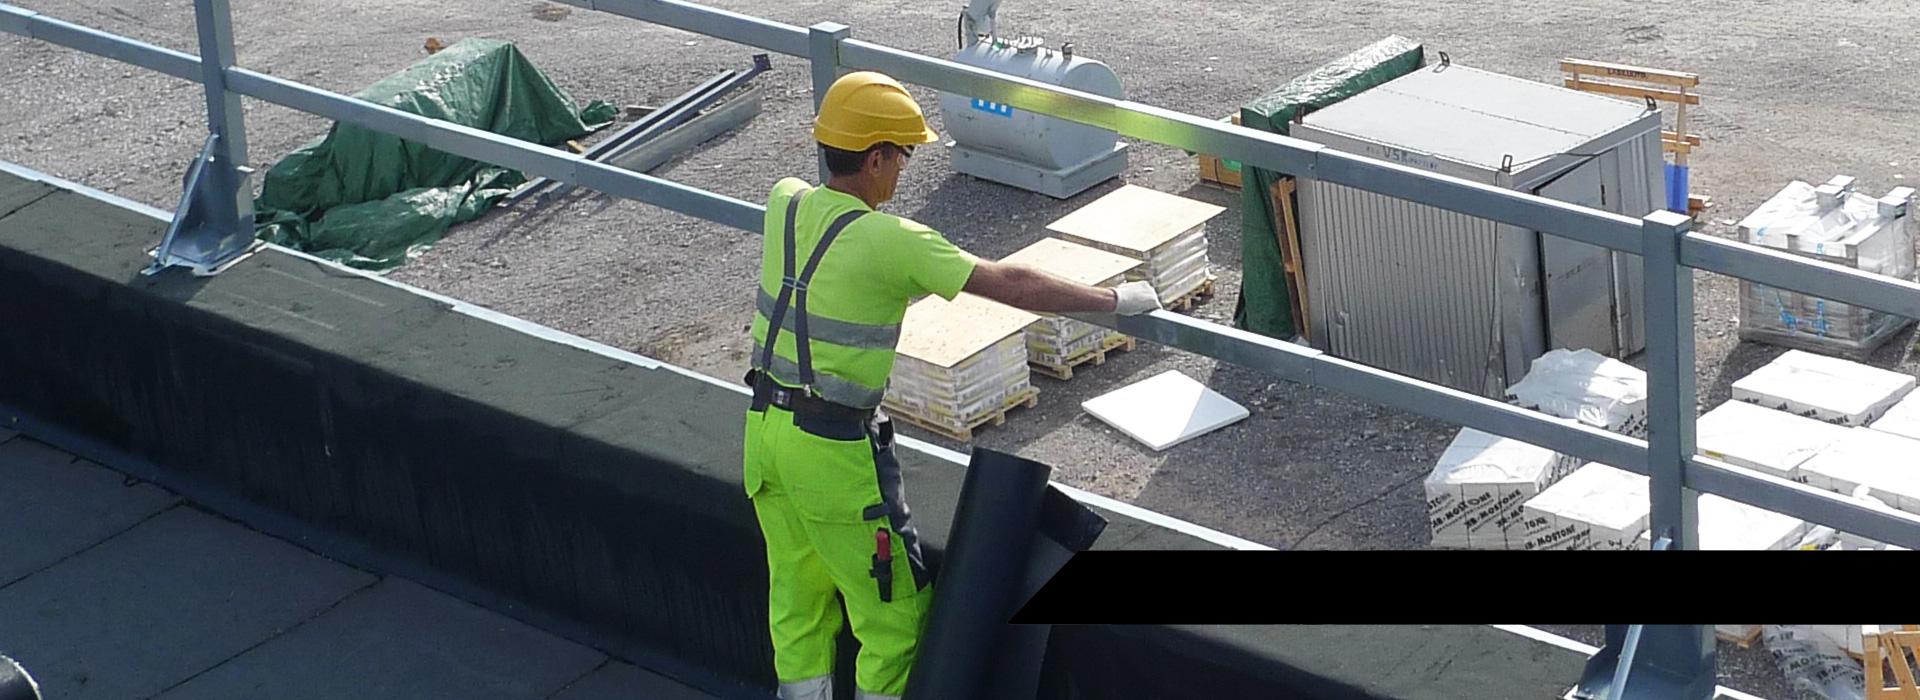 Roof Safety Solutions - Slide 2